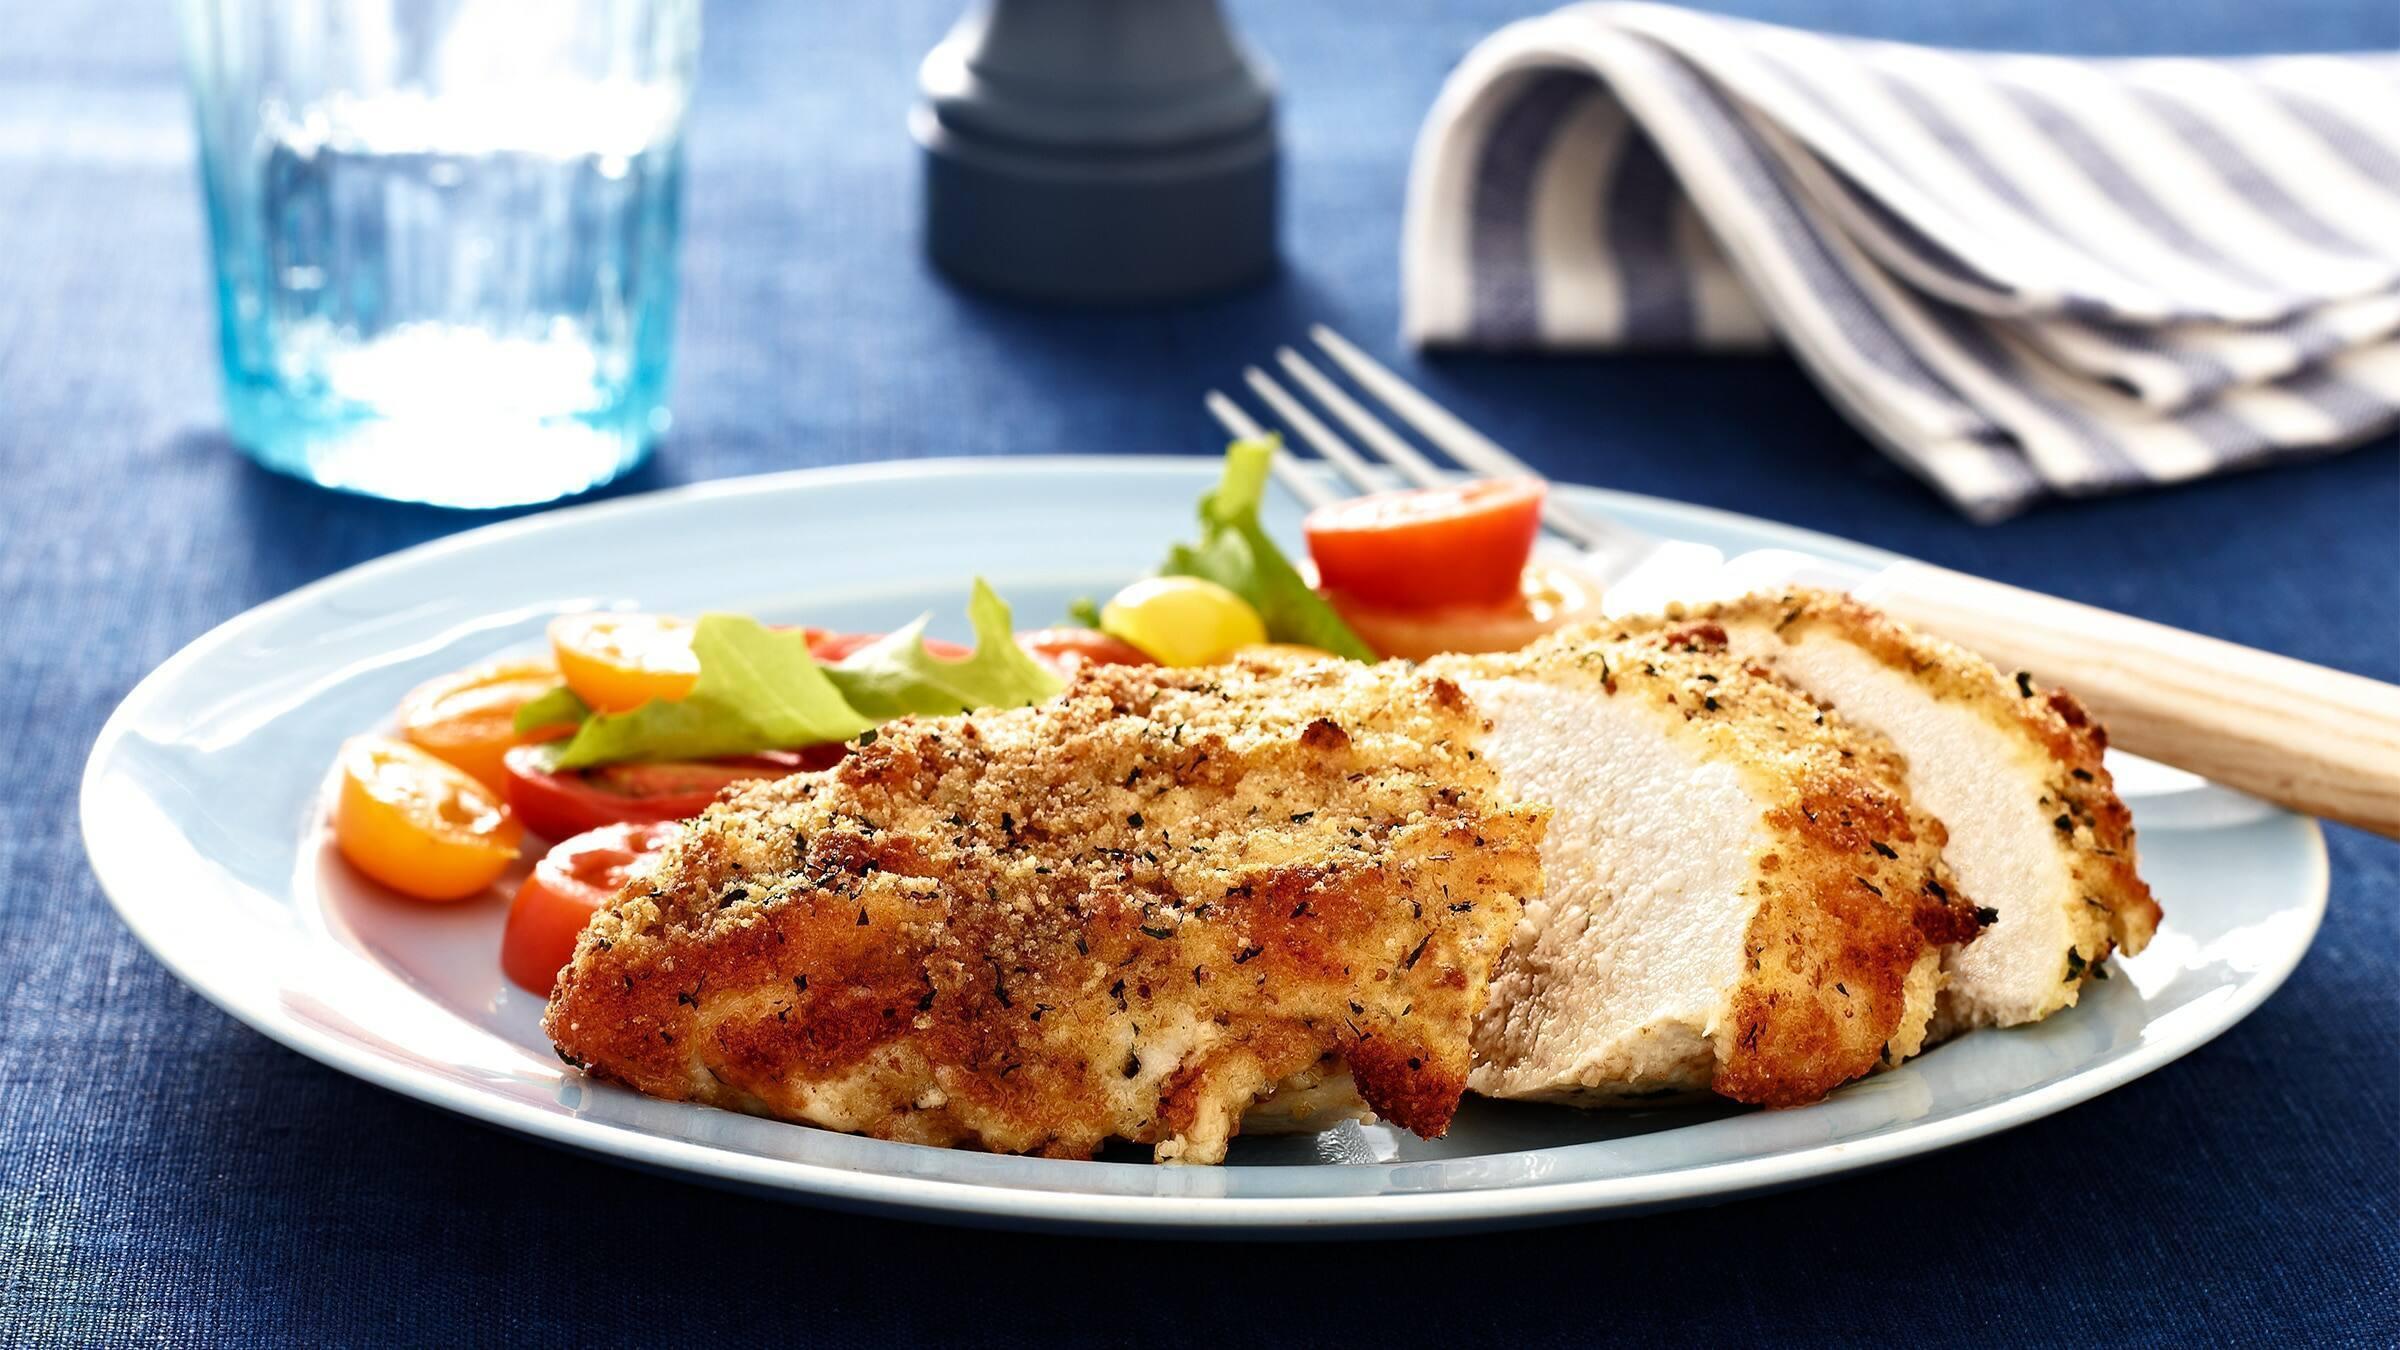 Parmesan Crusted Chicken Recipe Crusted Chicken Recipe